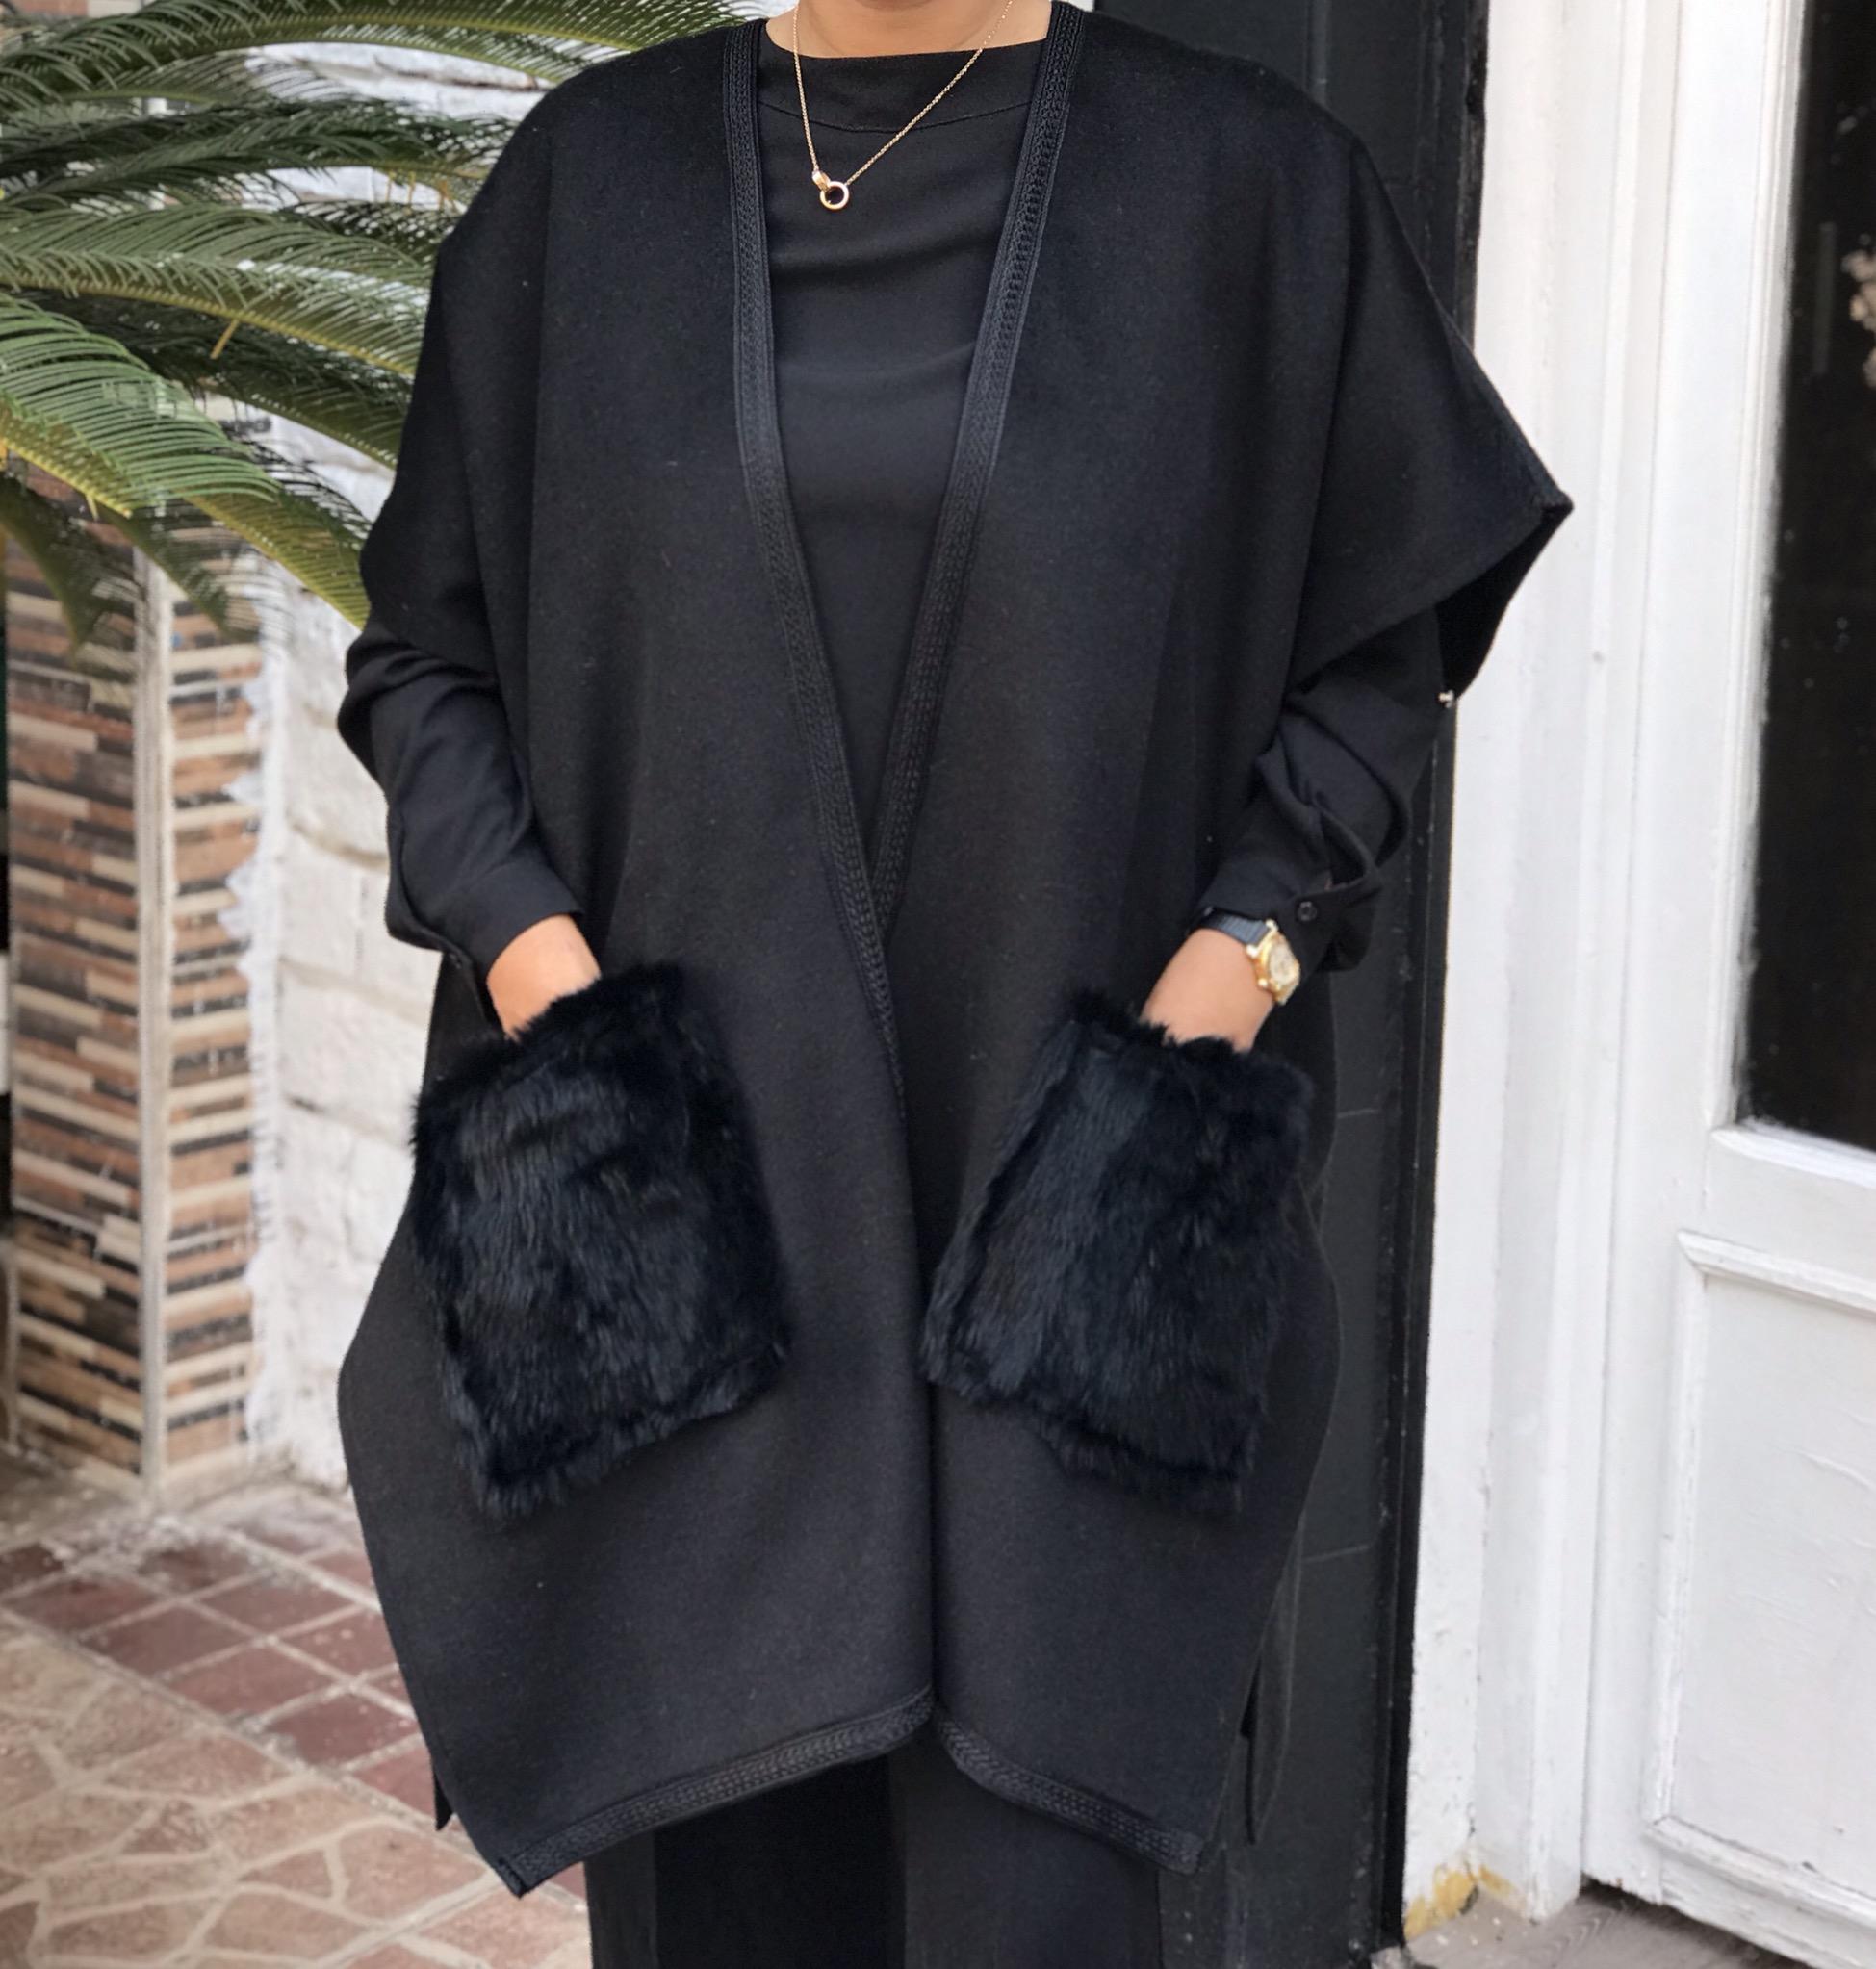 Kimono cashemire black with black rabbit pockets